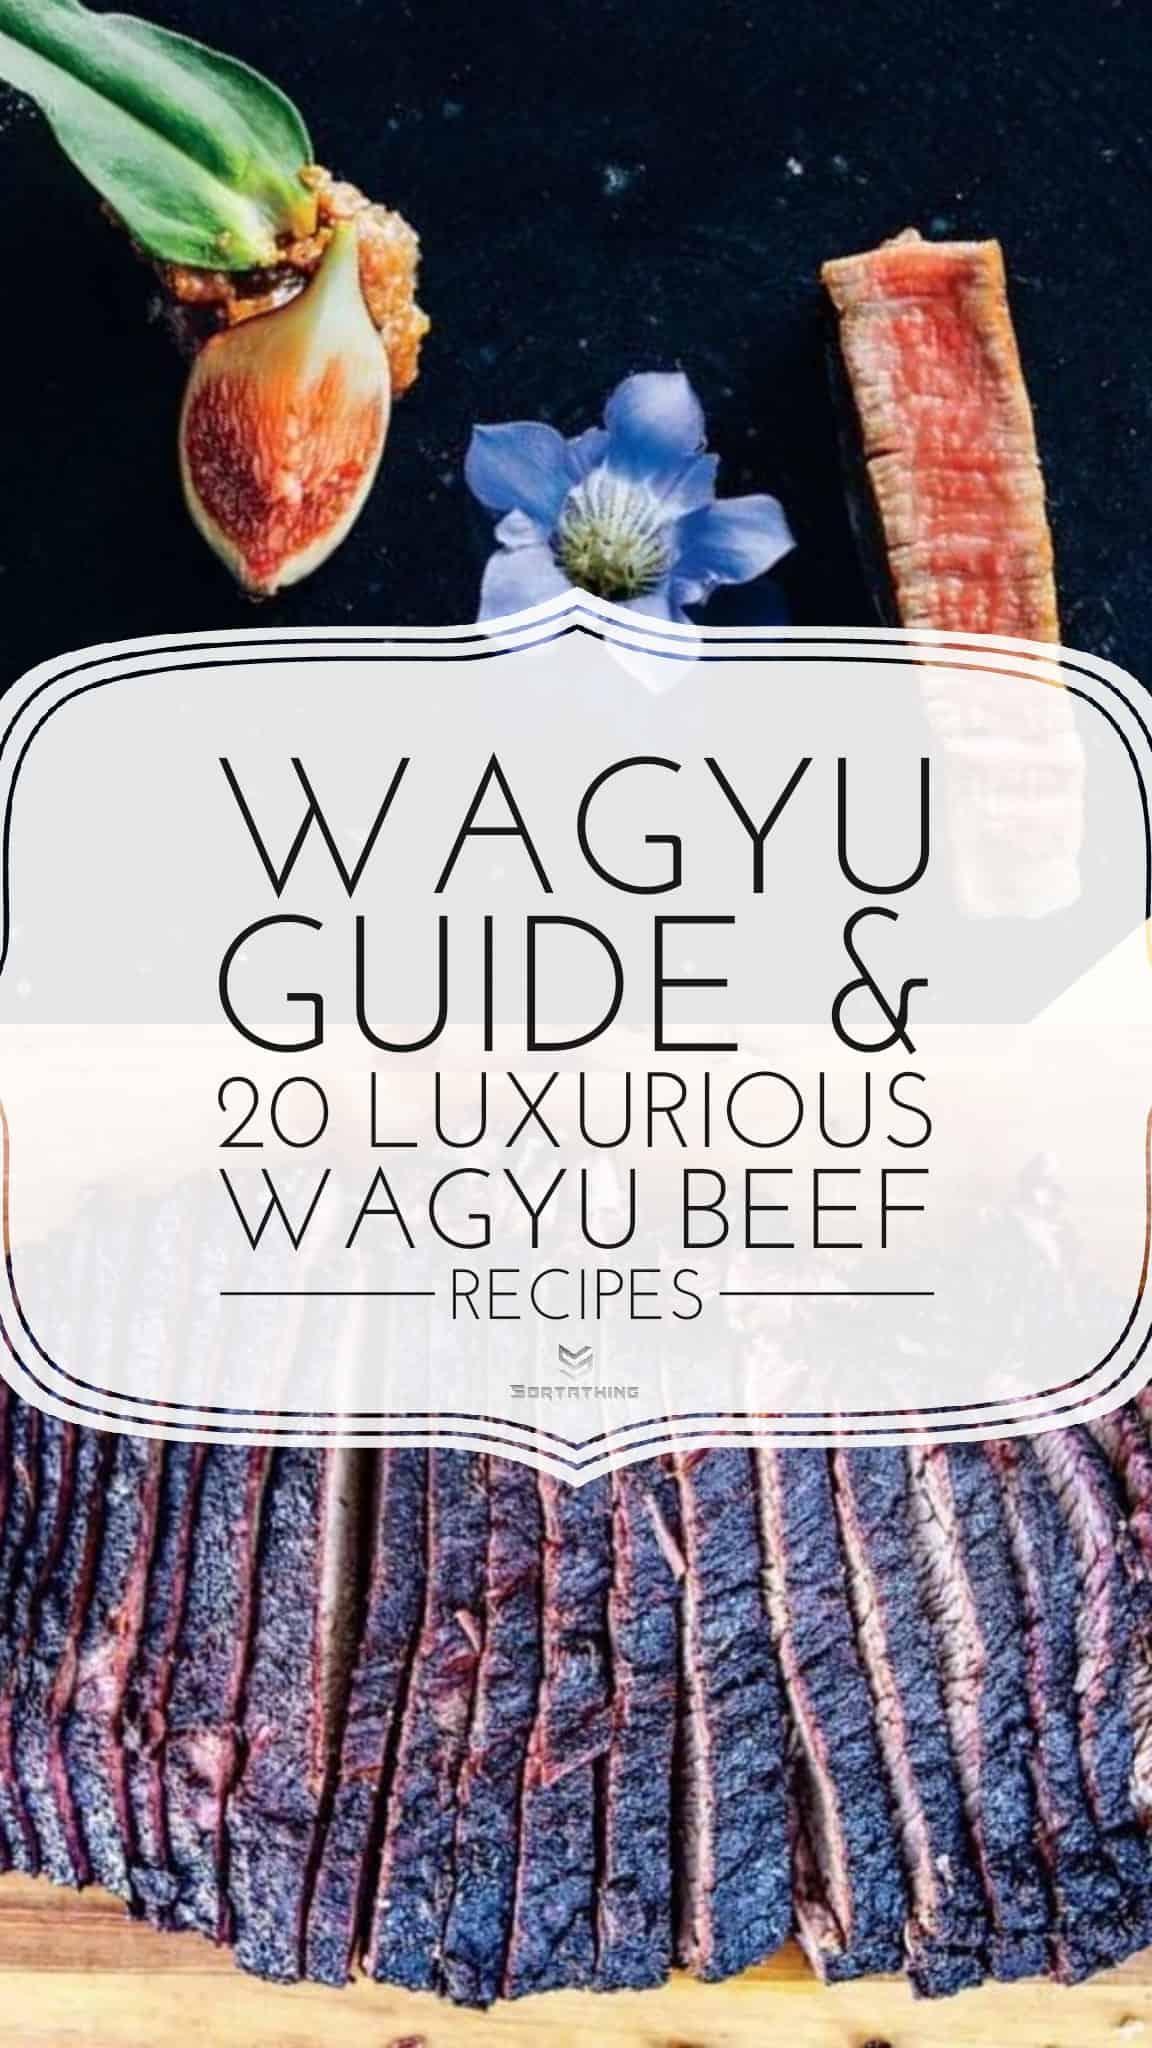 Grilled Wagyu Ribeye with Roasted Fig Miso and Smoked Wagyu Brisket